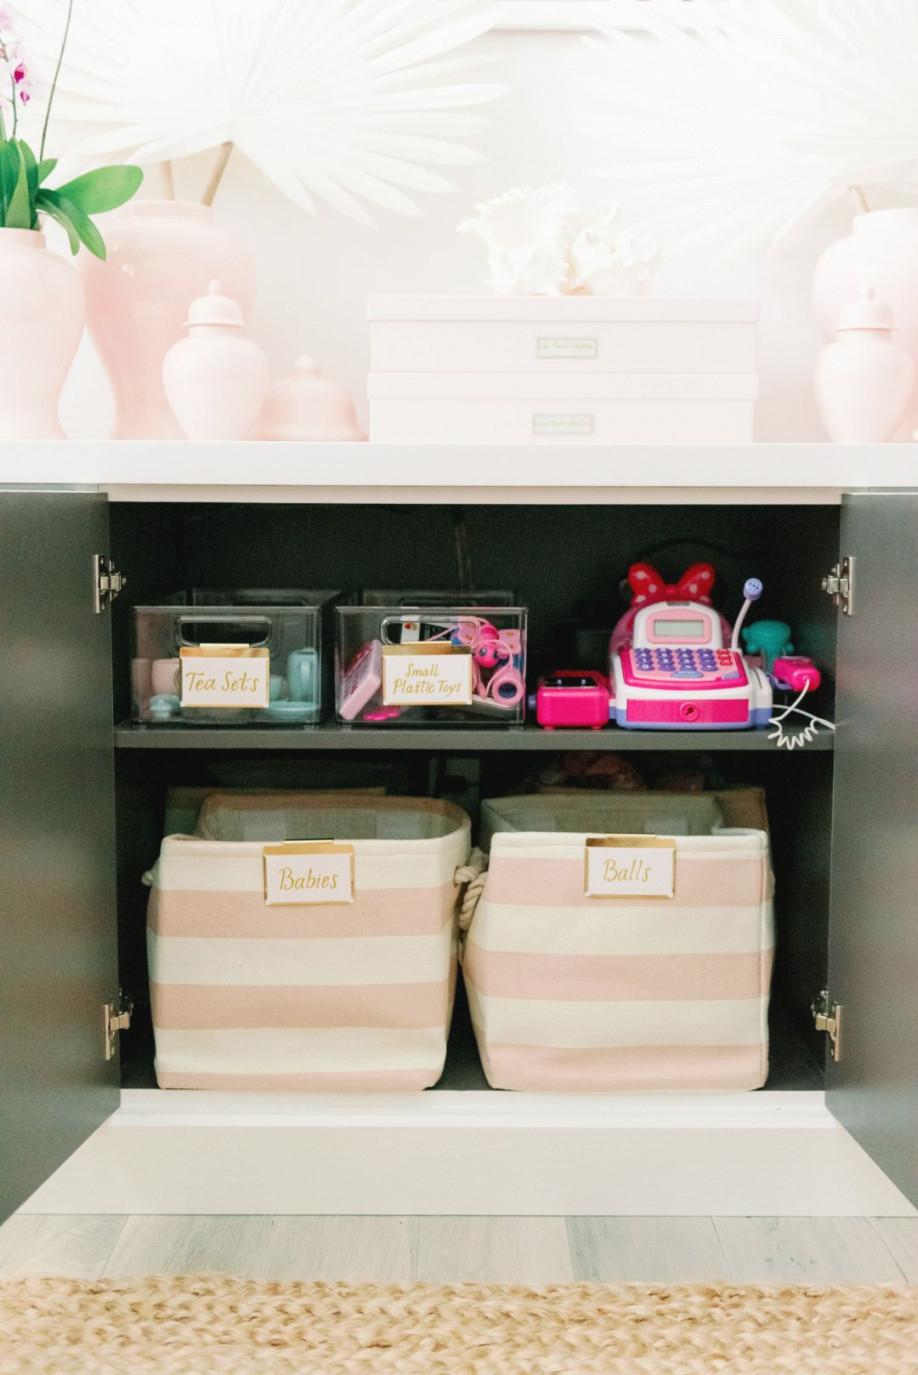 25 Best Toy Organizer Ideas - Diy Kids' Room Storage Ideas for 8+ Amazing Inspiration Ideas For Toy Storage Ideas Living Room